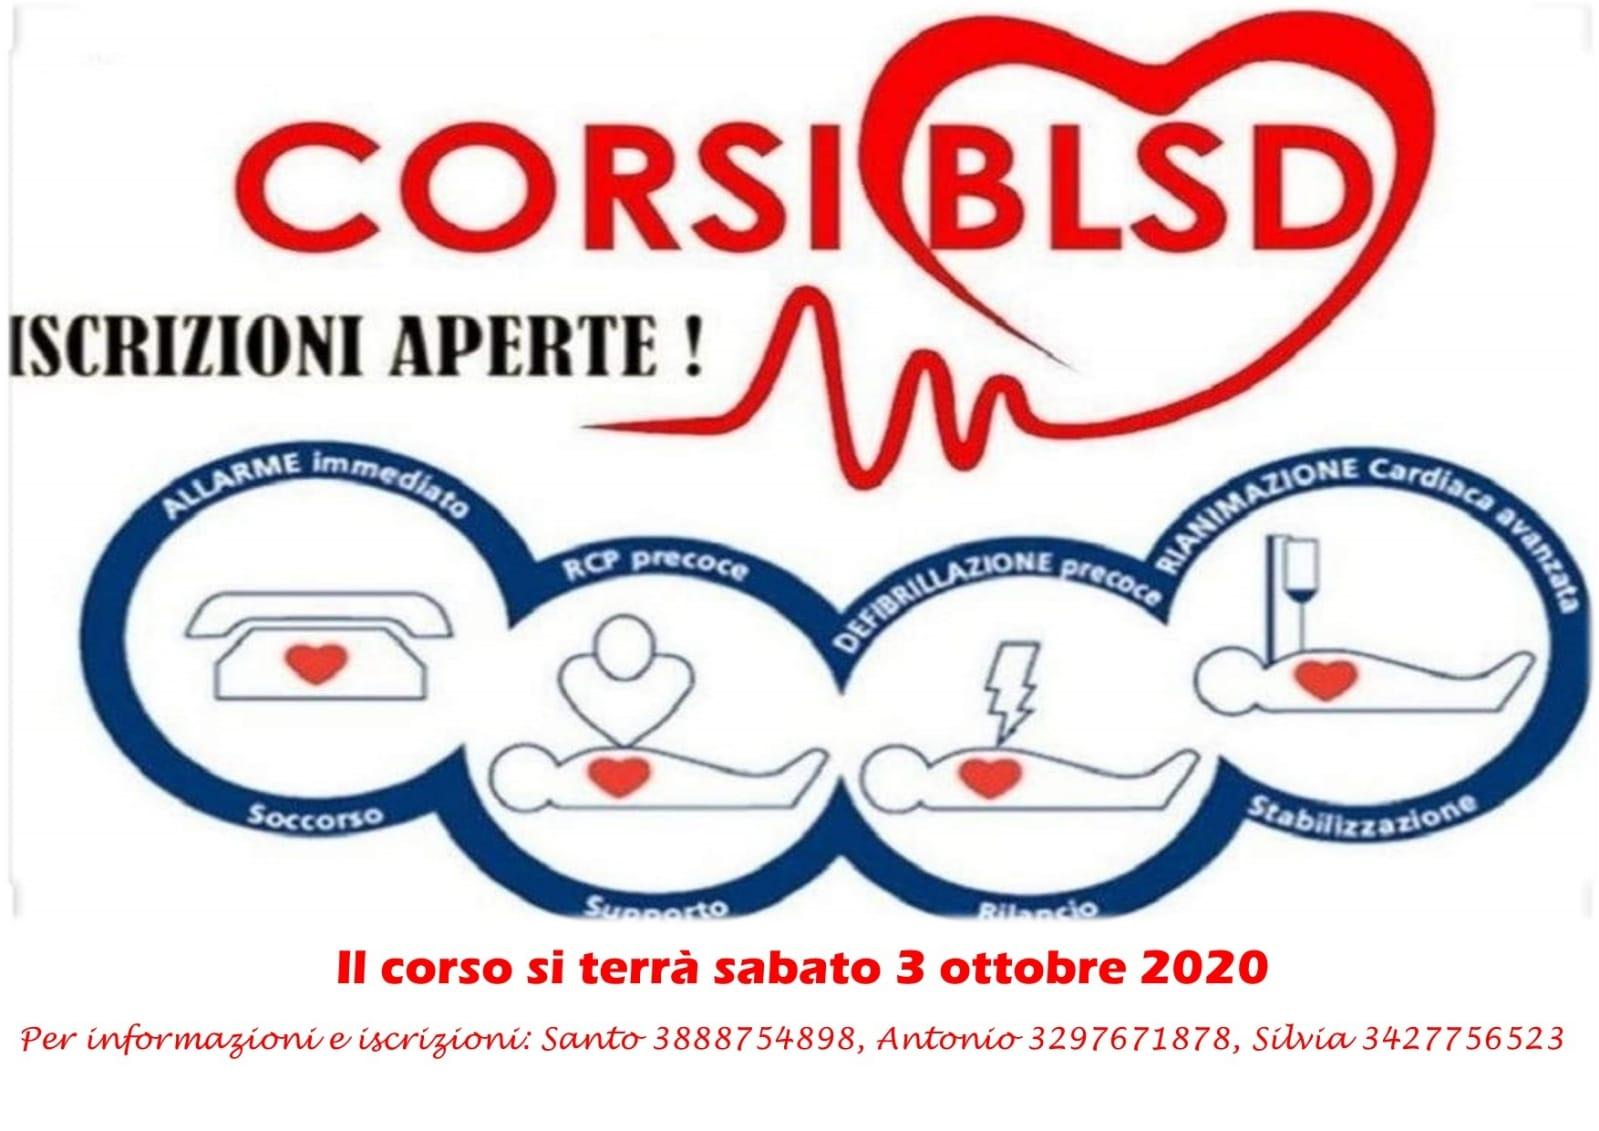 031020 Corso BLSD